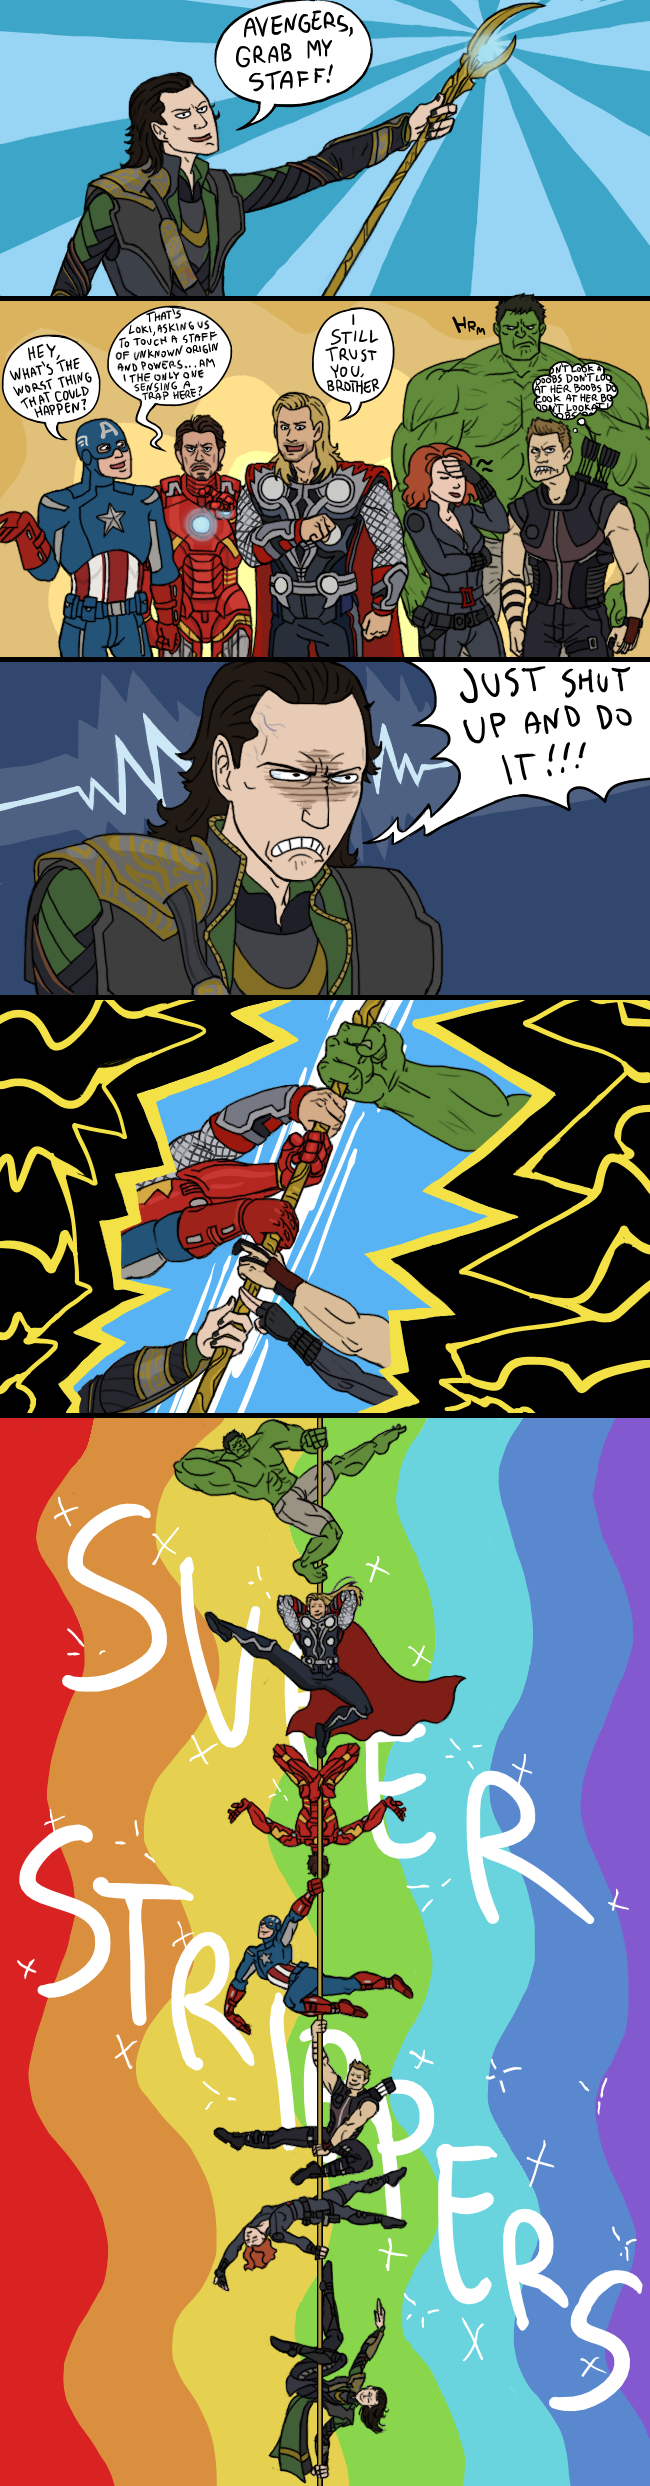 http://fc00.deviantart.net/fs70/f/2011/304/c/d/avengers__strippers_assemble_by_sparkyhero-d4eo05z.png